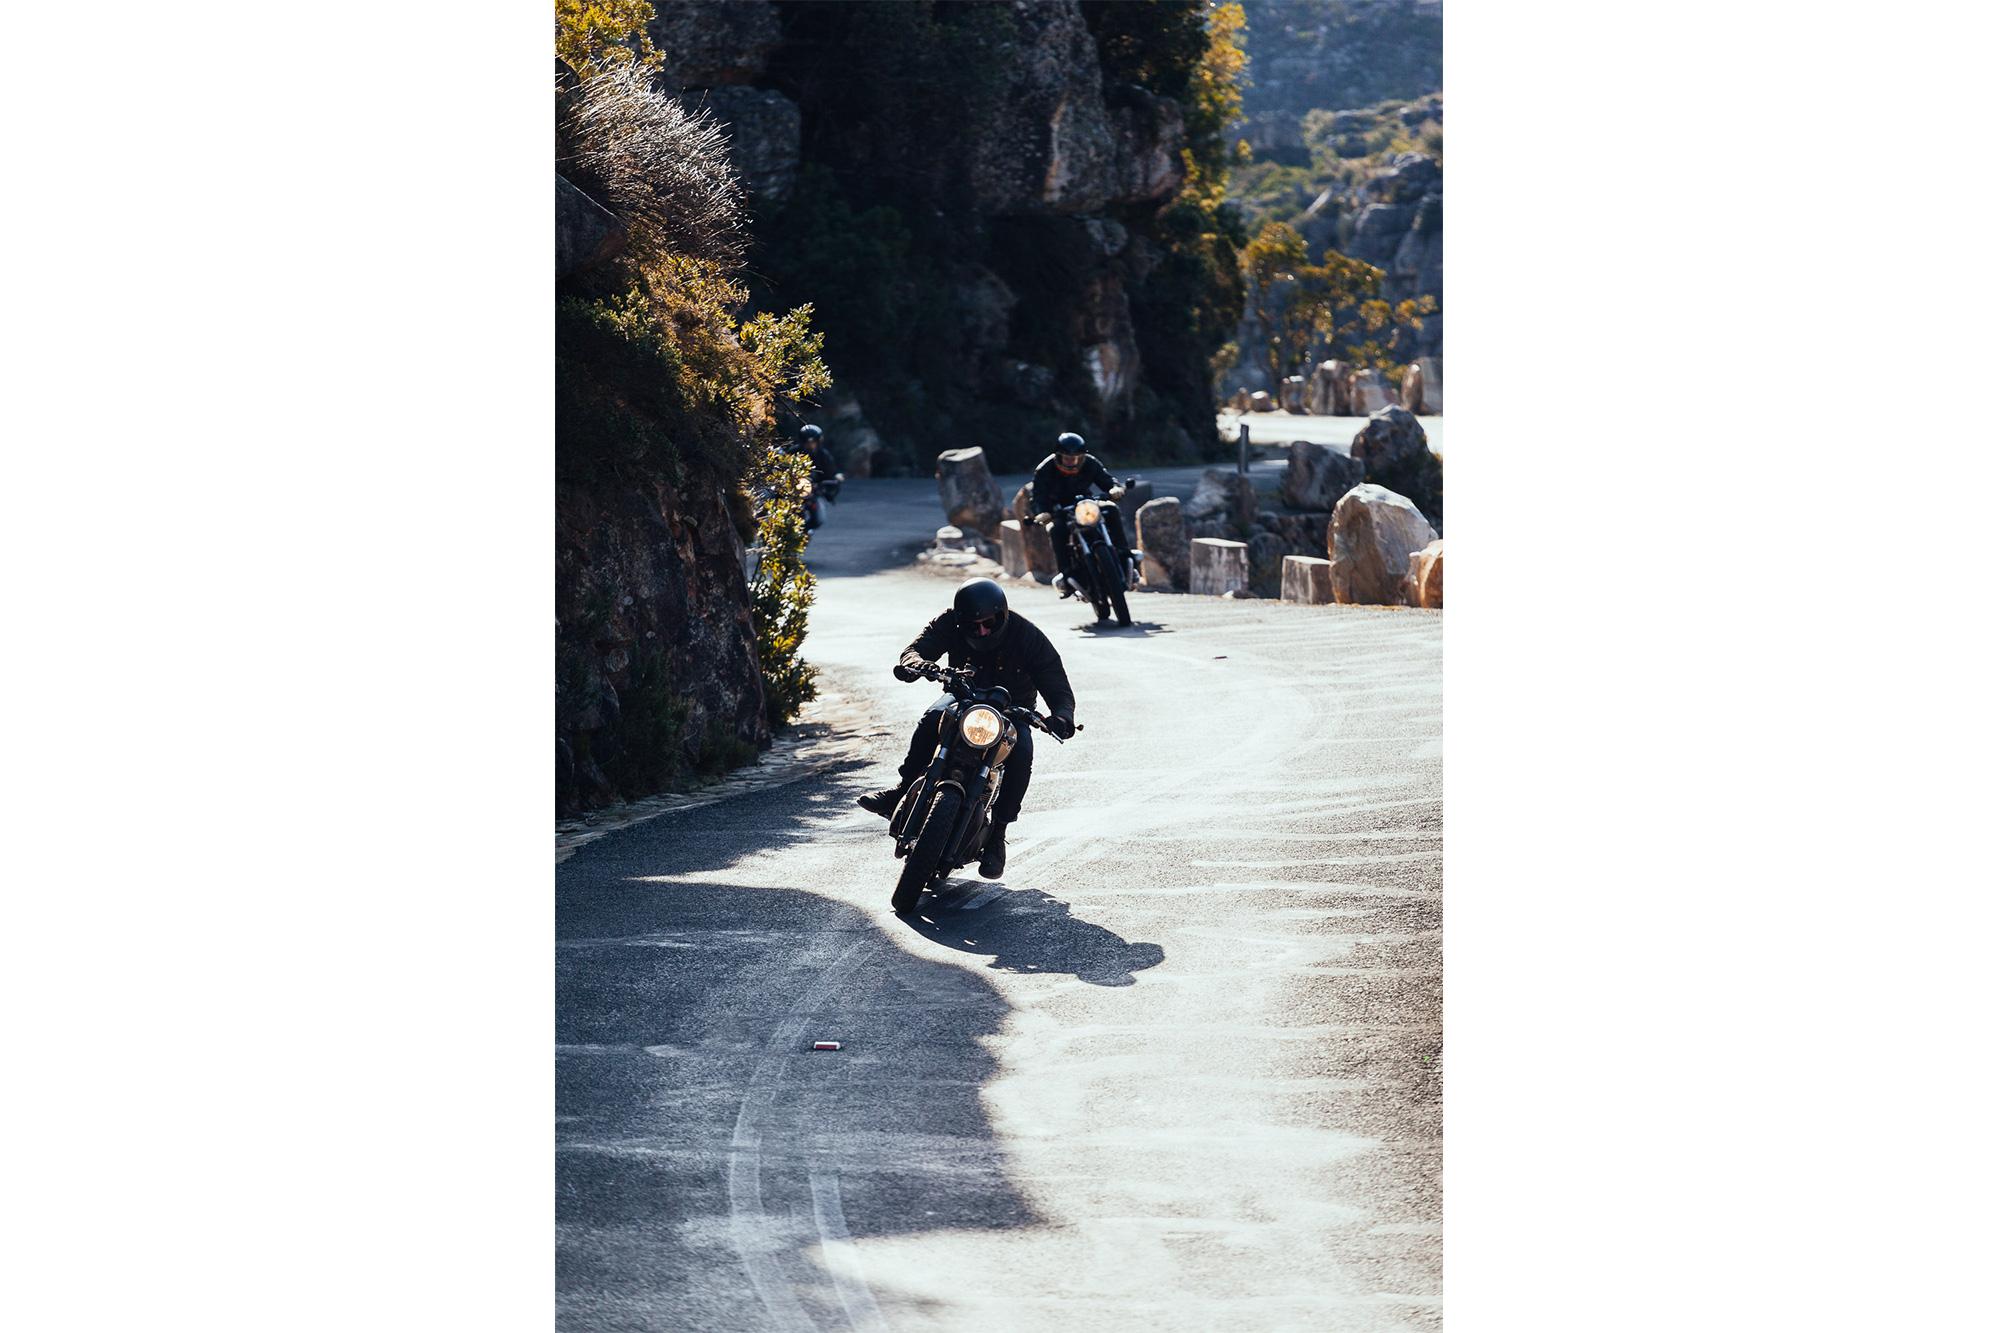 Bainskloof Pass, South Africa